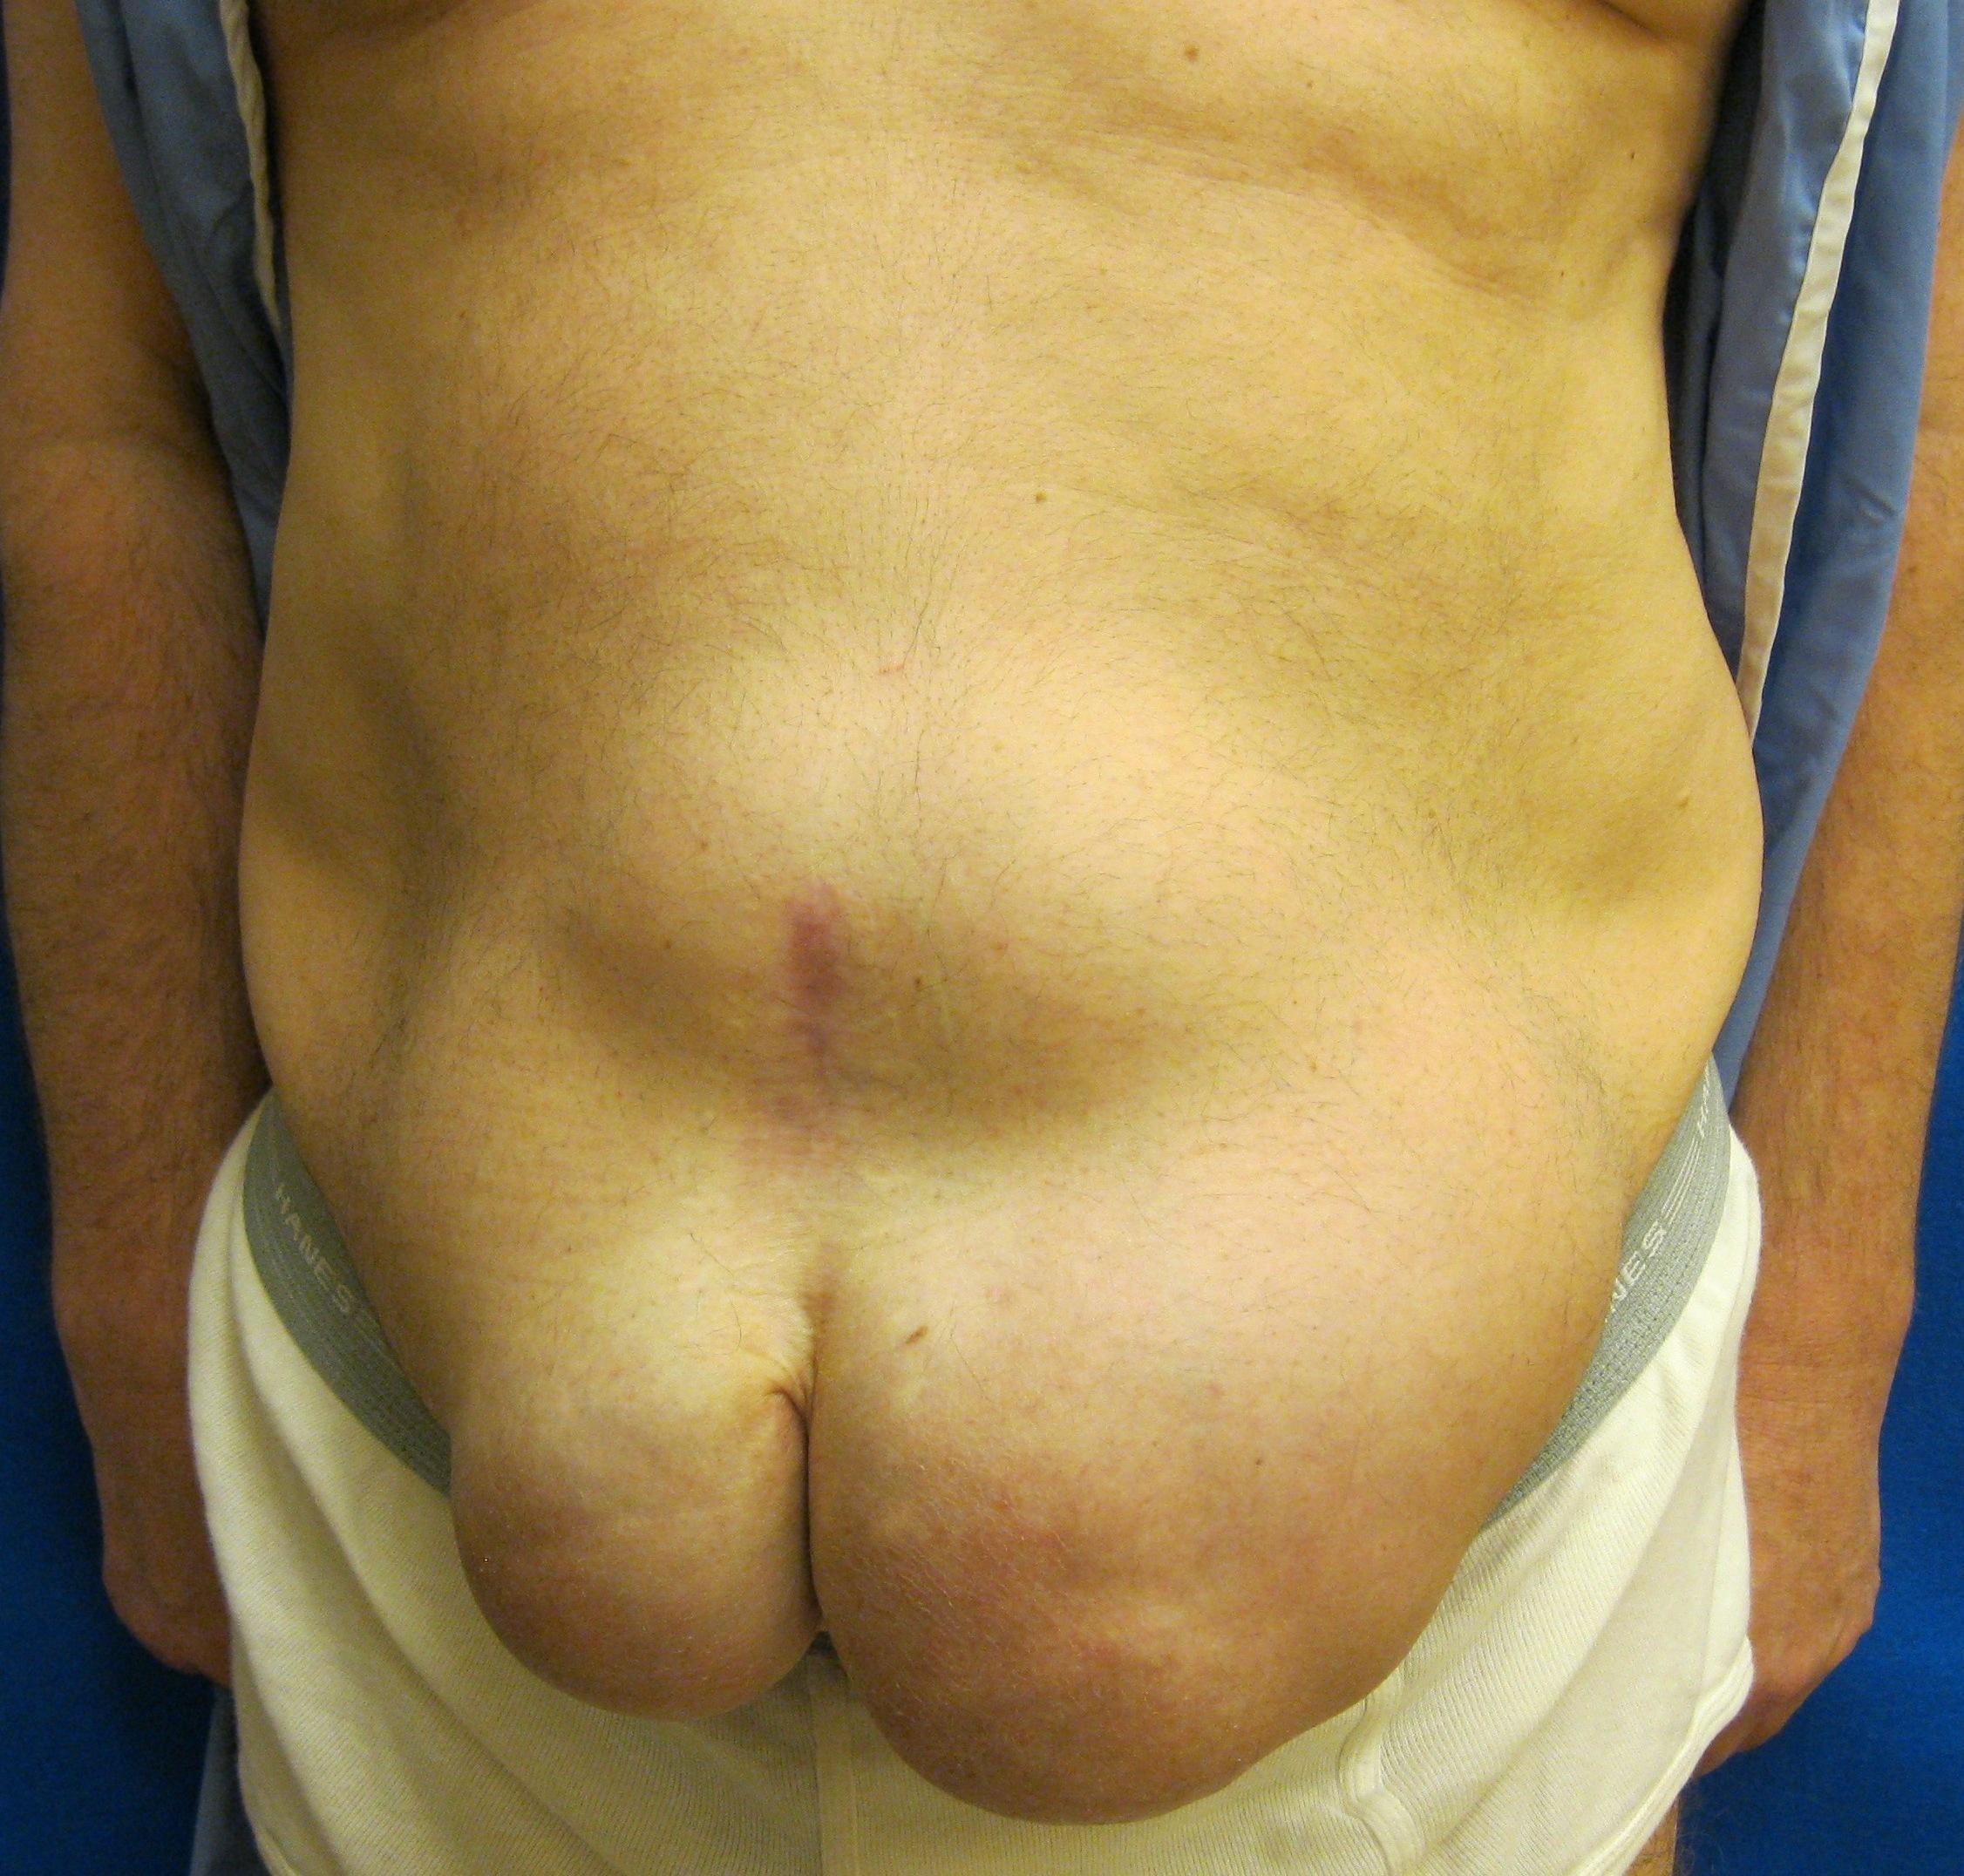 Hernia Repair Pig Skin Mesh Bridgeport Fairfield - Abdominal Hernia